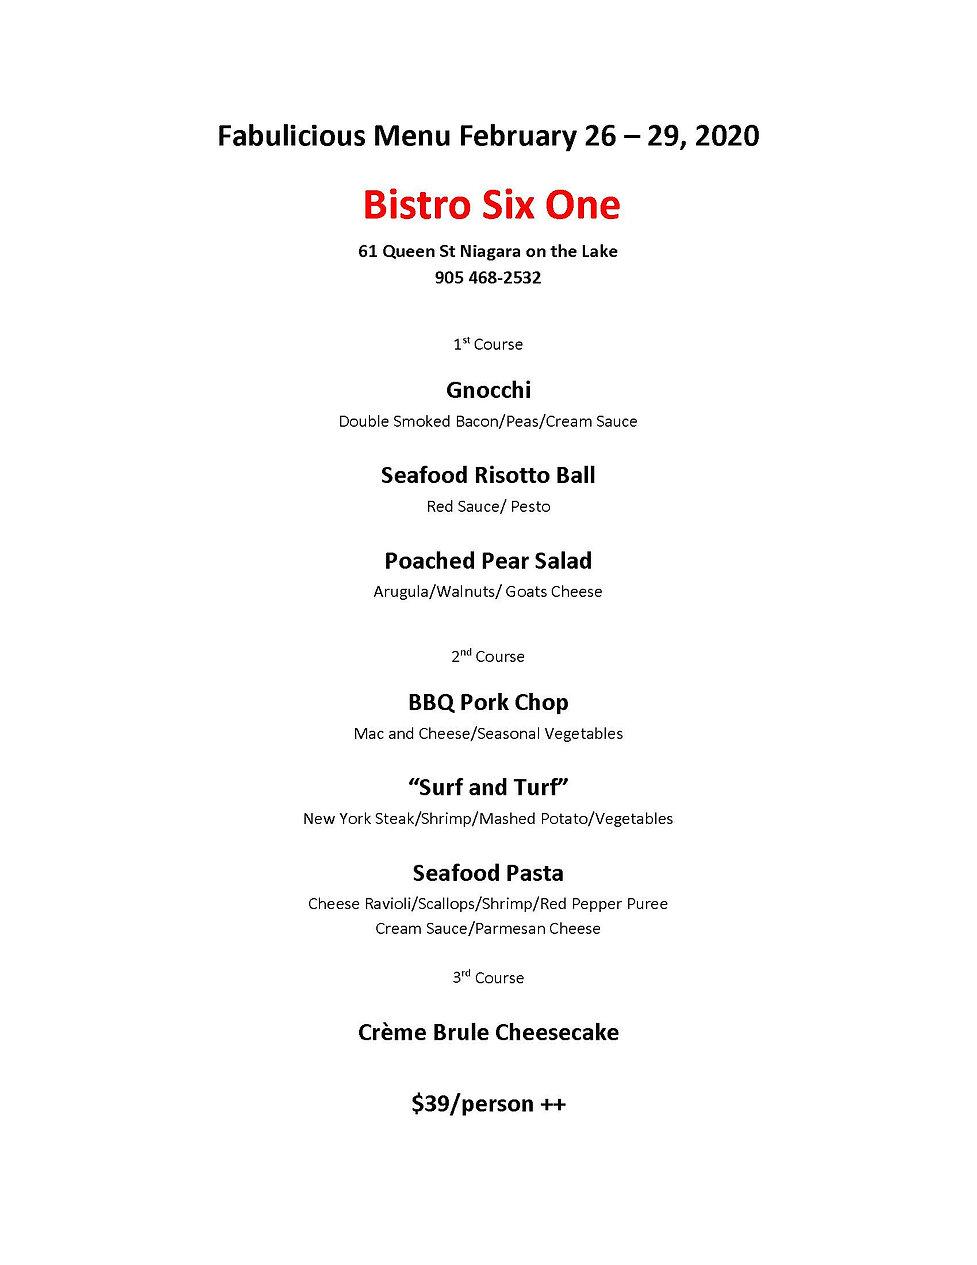 Fabulicious Feb 2020 Bistro Six One.pdf.